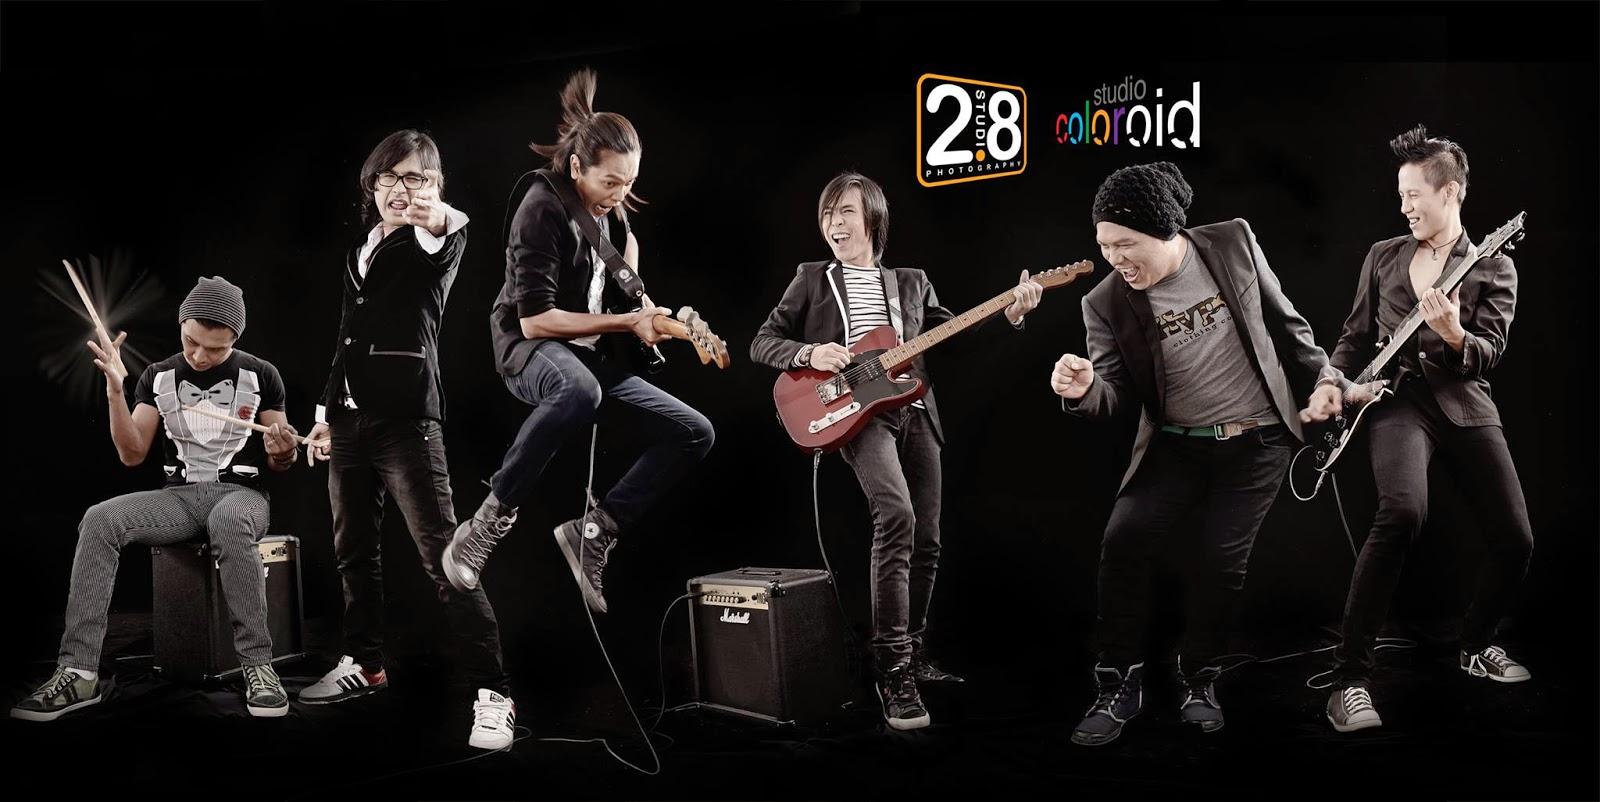 Hyper Act Band